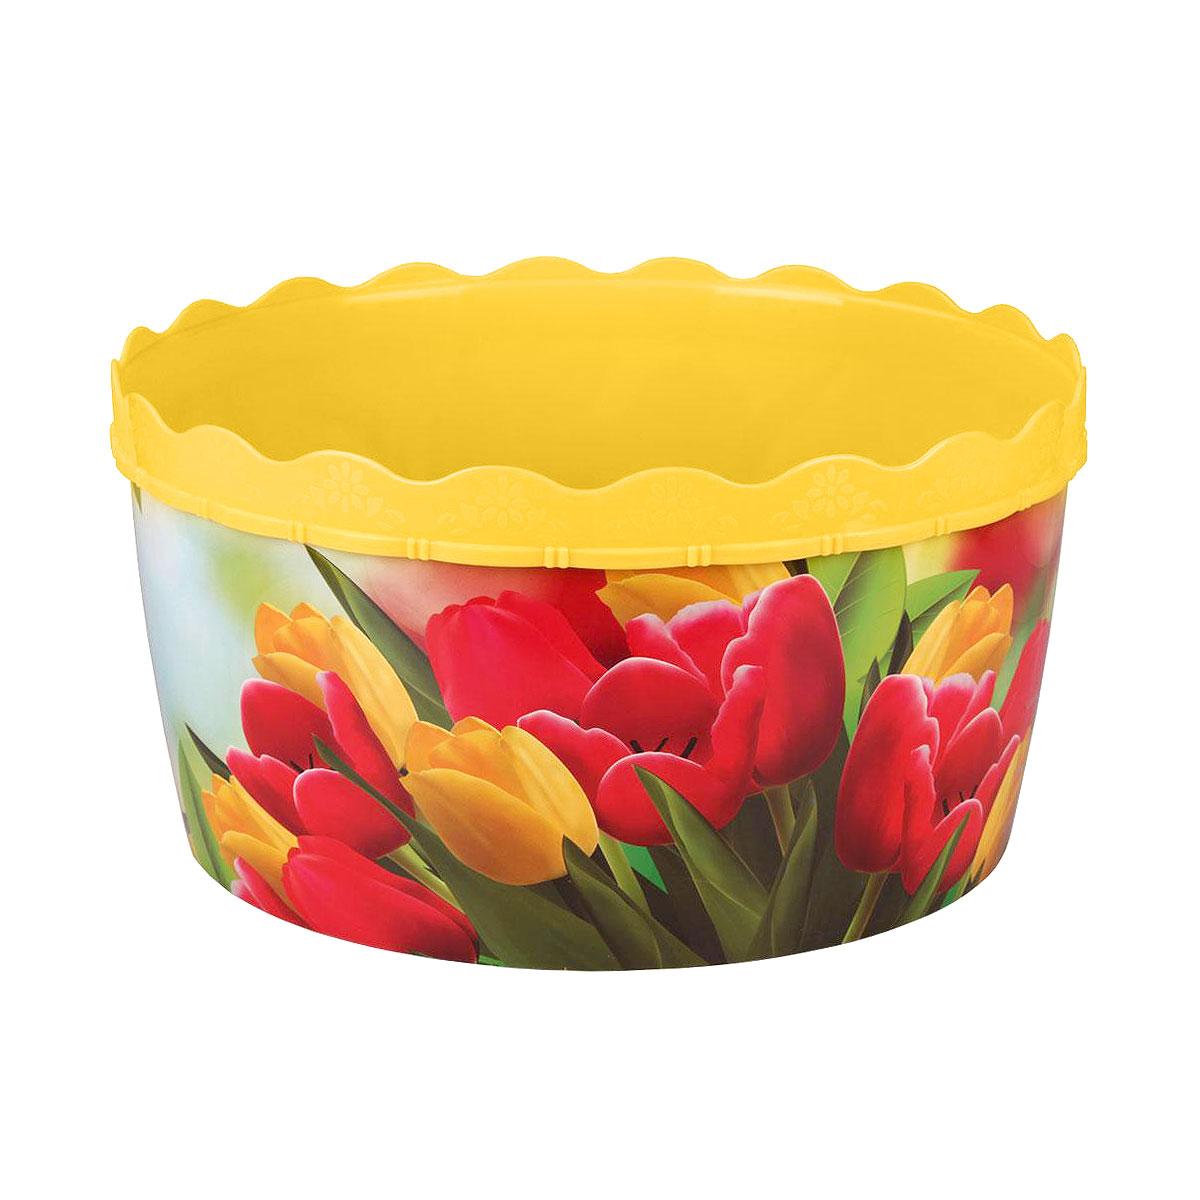 Таз Тюльпаны, цвет: желтый, 12 л таз азалия объем 10 л цвет зеленый 952965